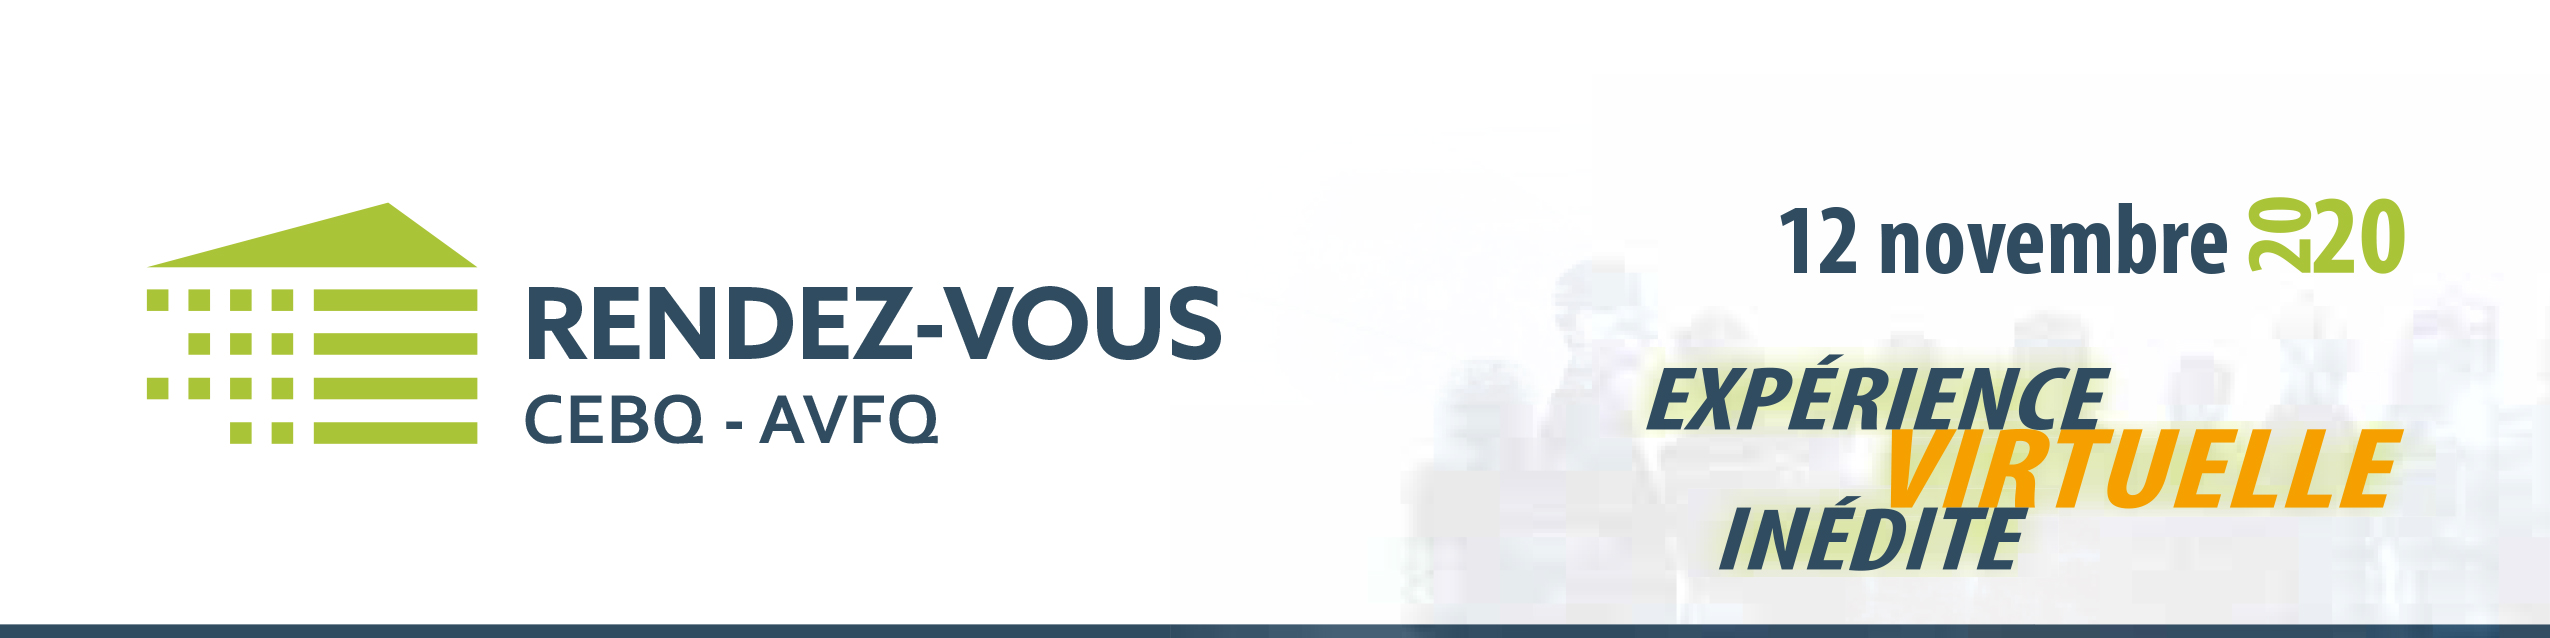 Banniere-web-RV_CEBQ-AVFQ_virtuel_2020